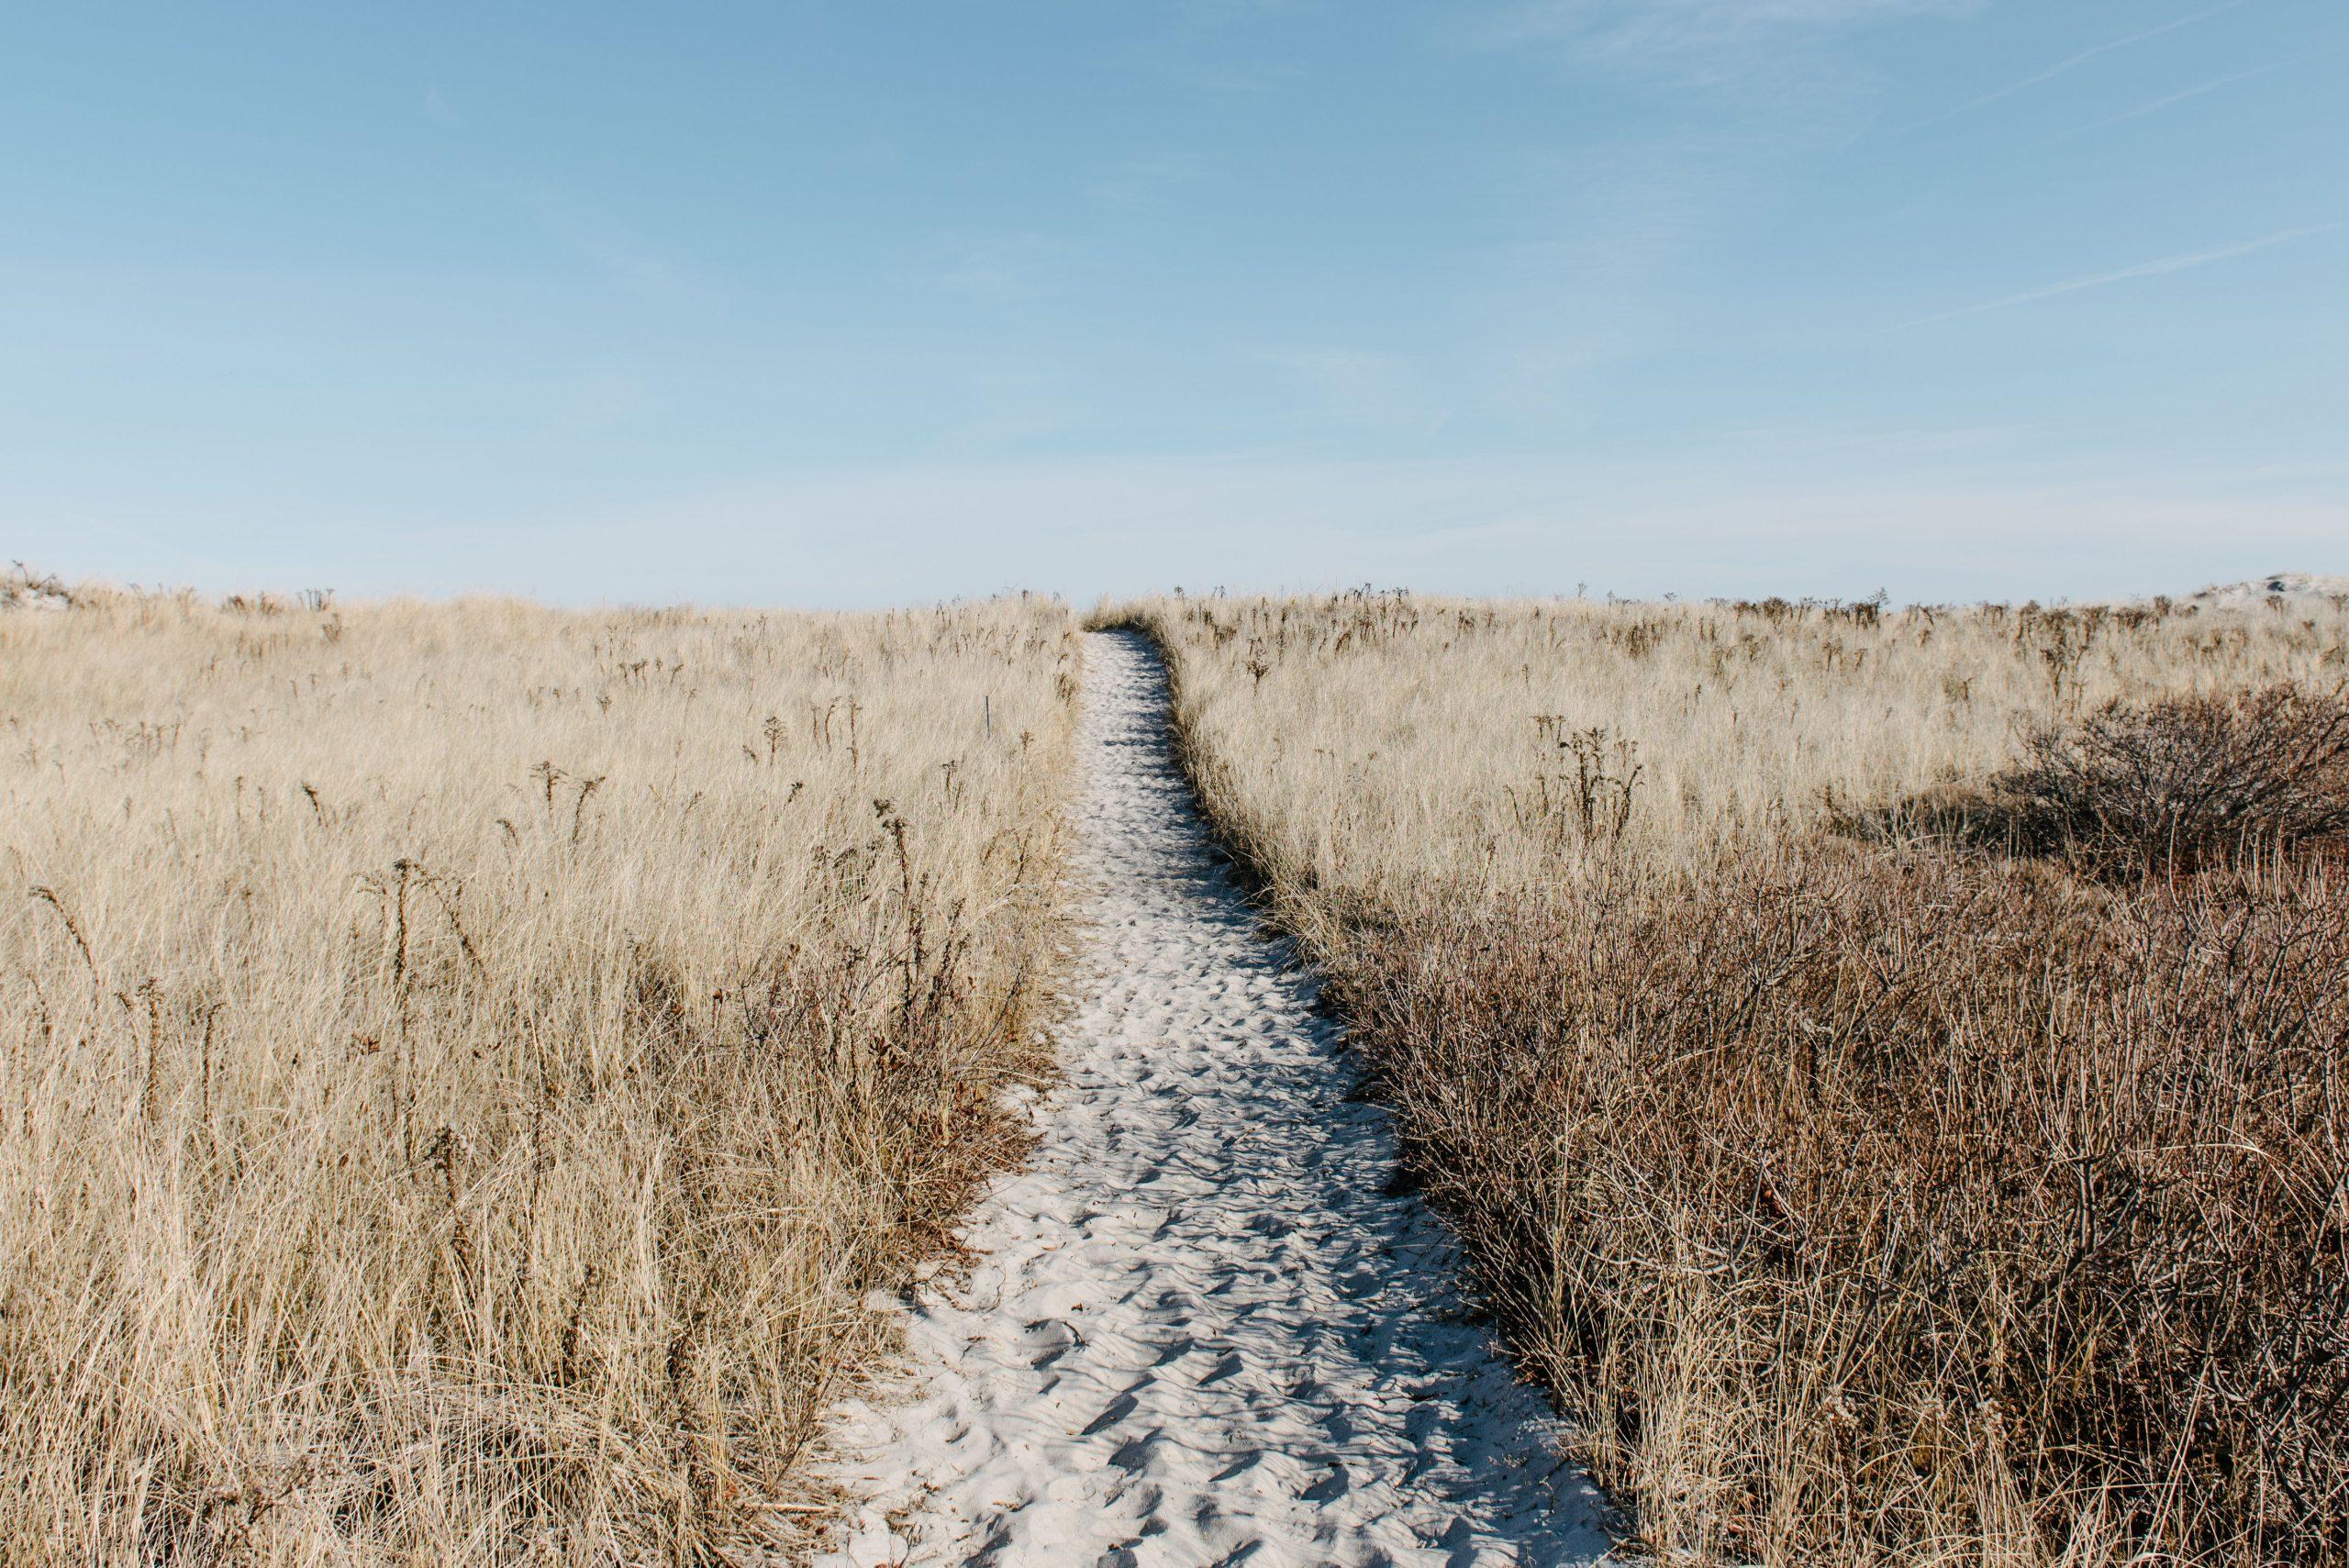 Sandy path through tall grass leading over a hill